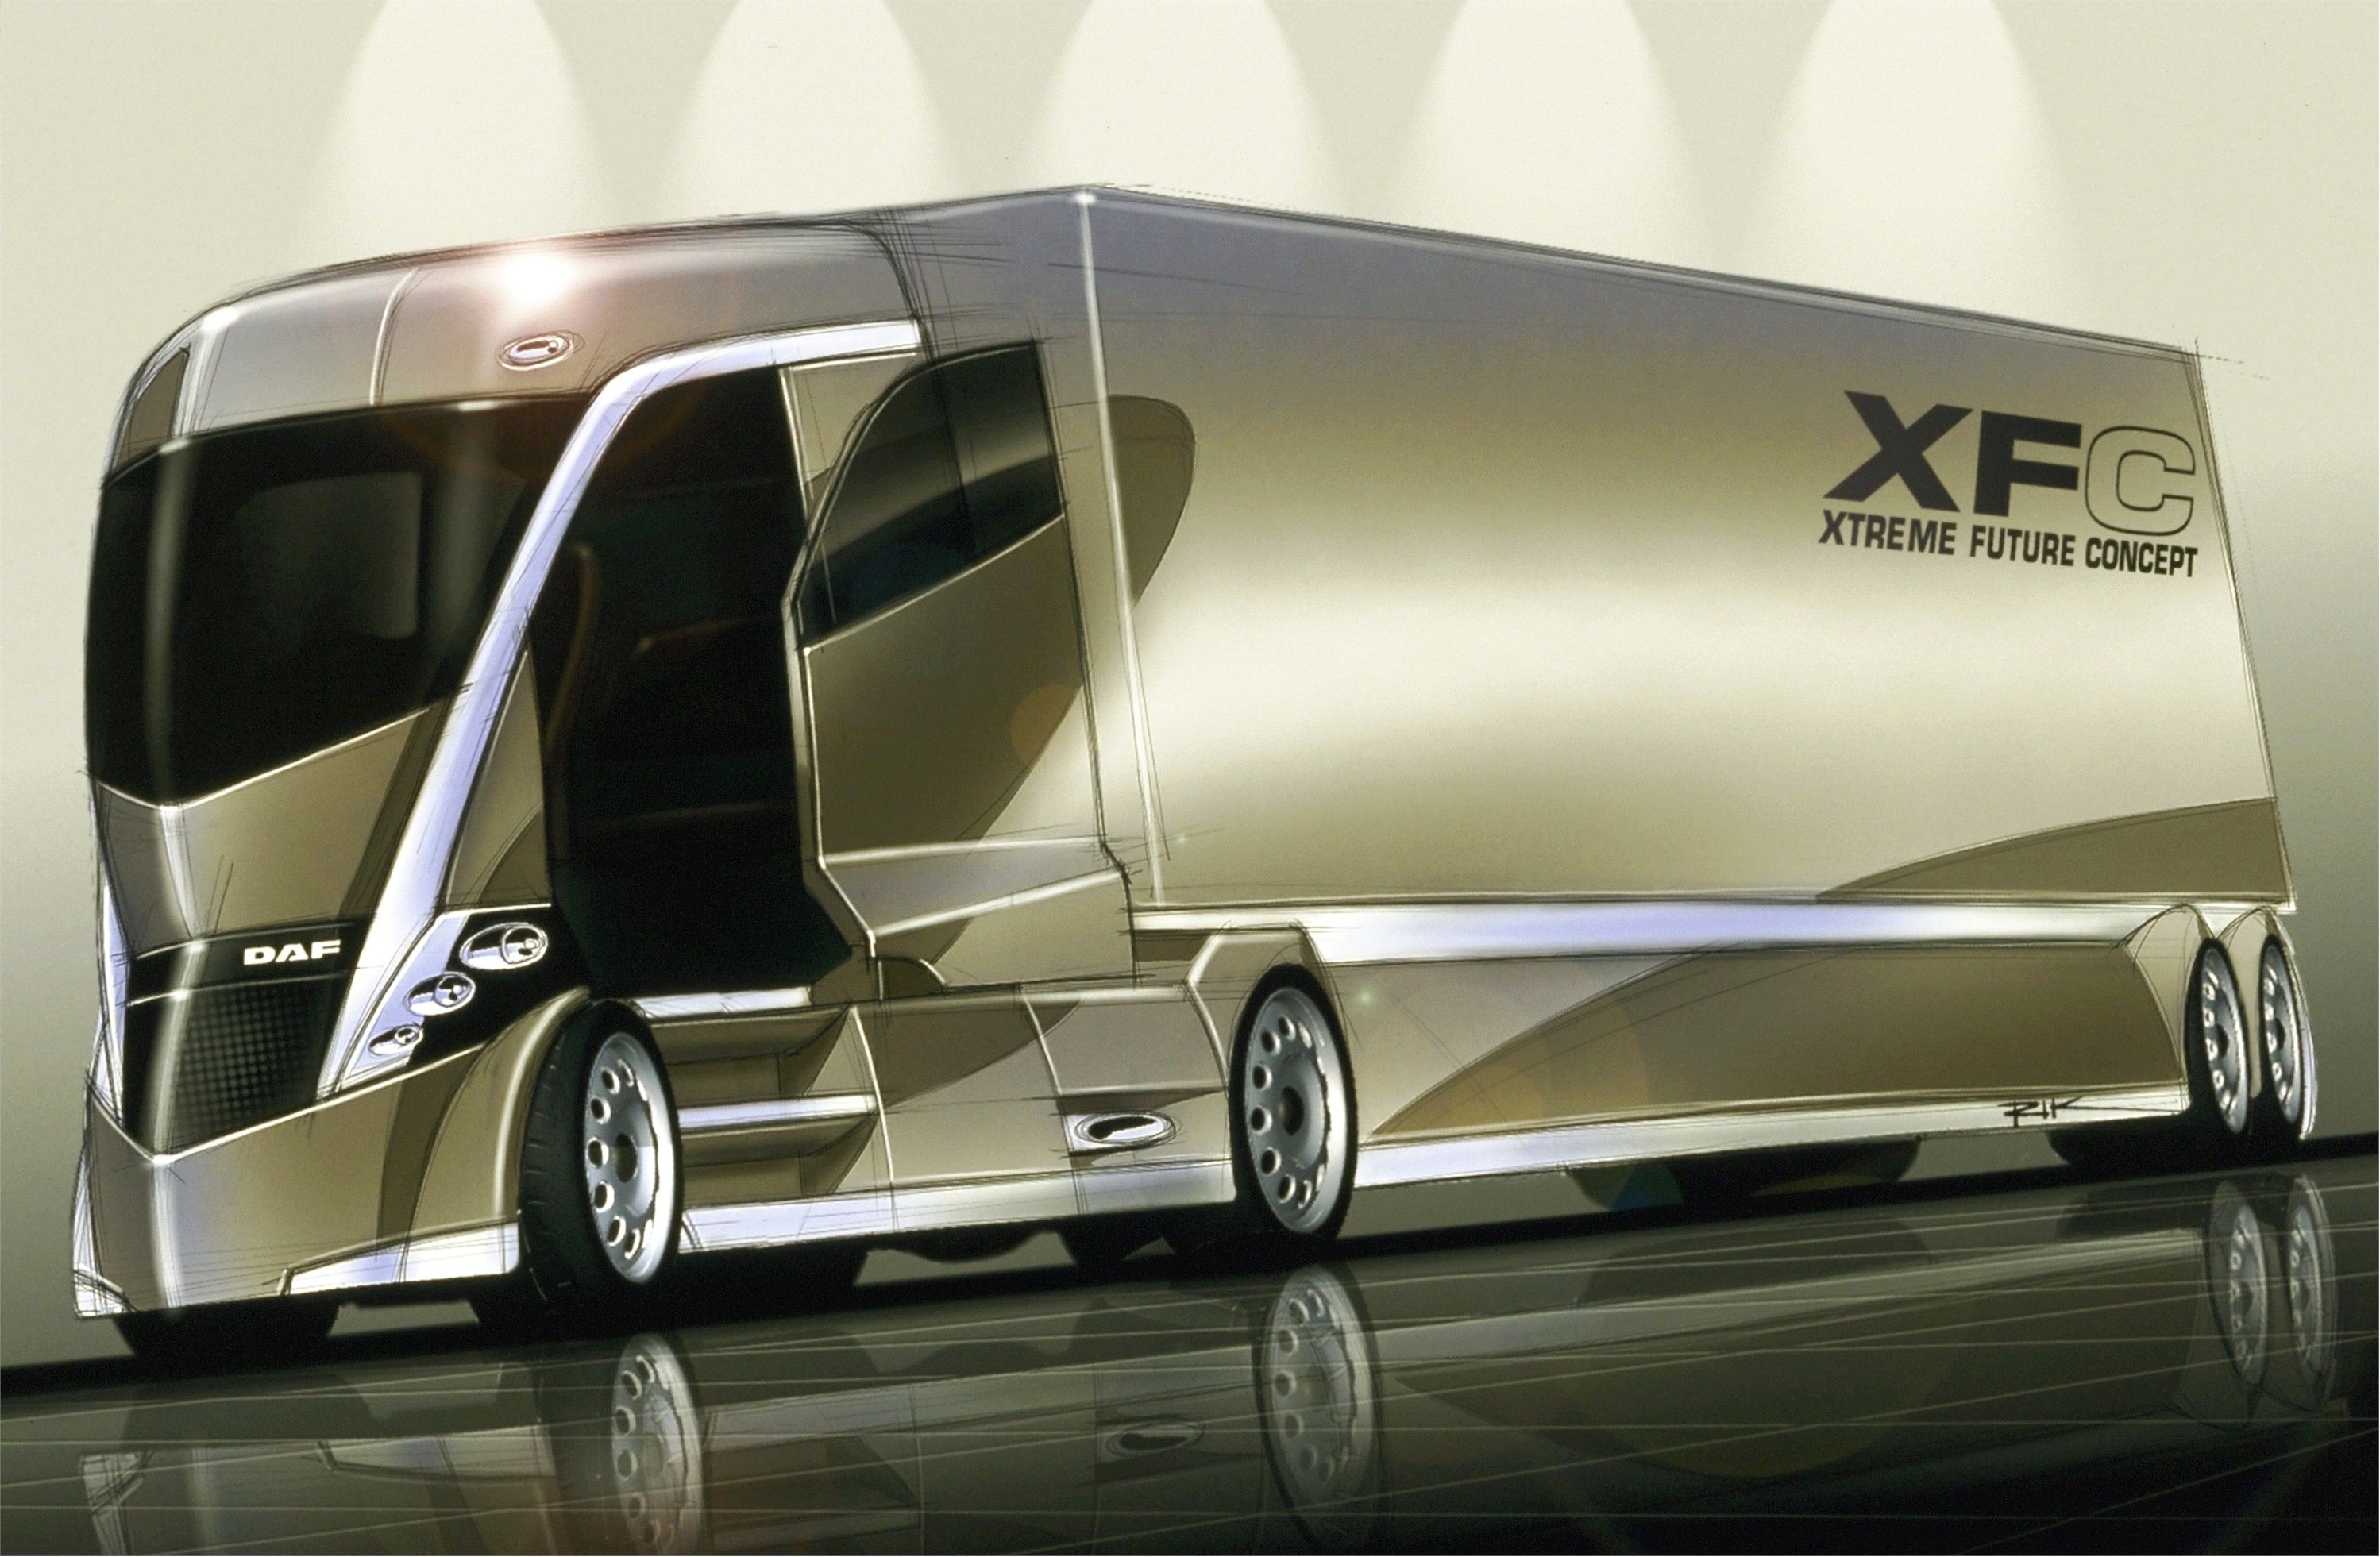 DAF XRC Concept Truck 1